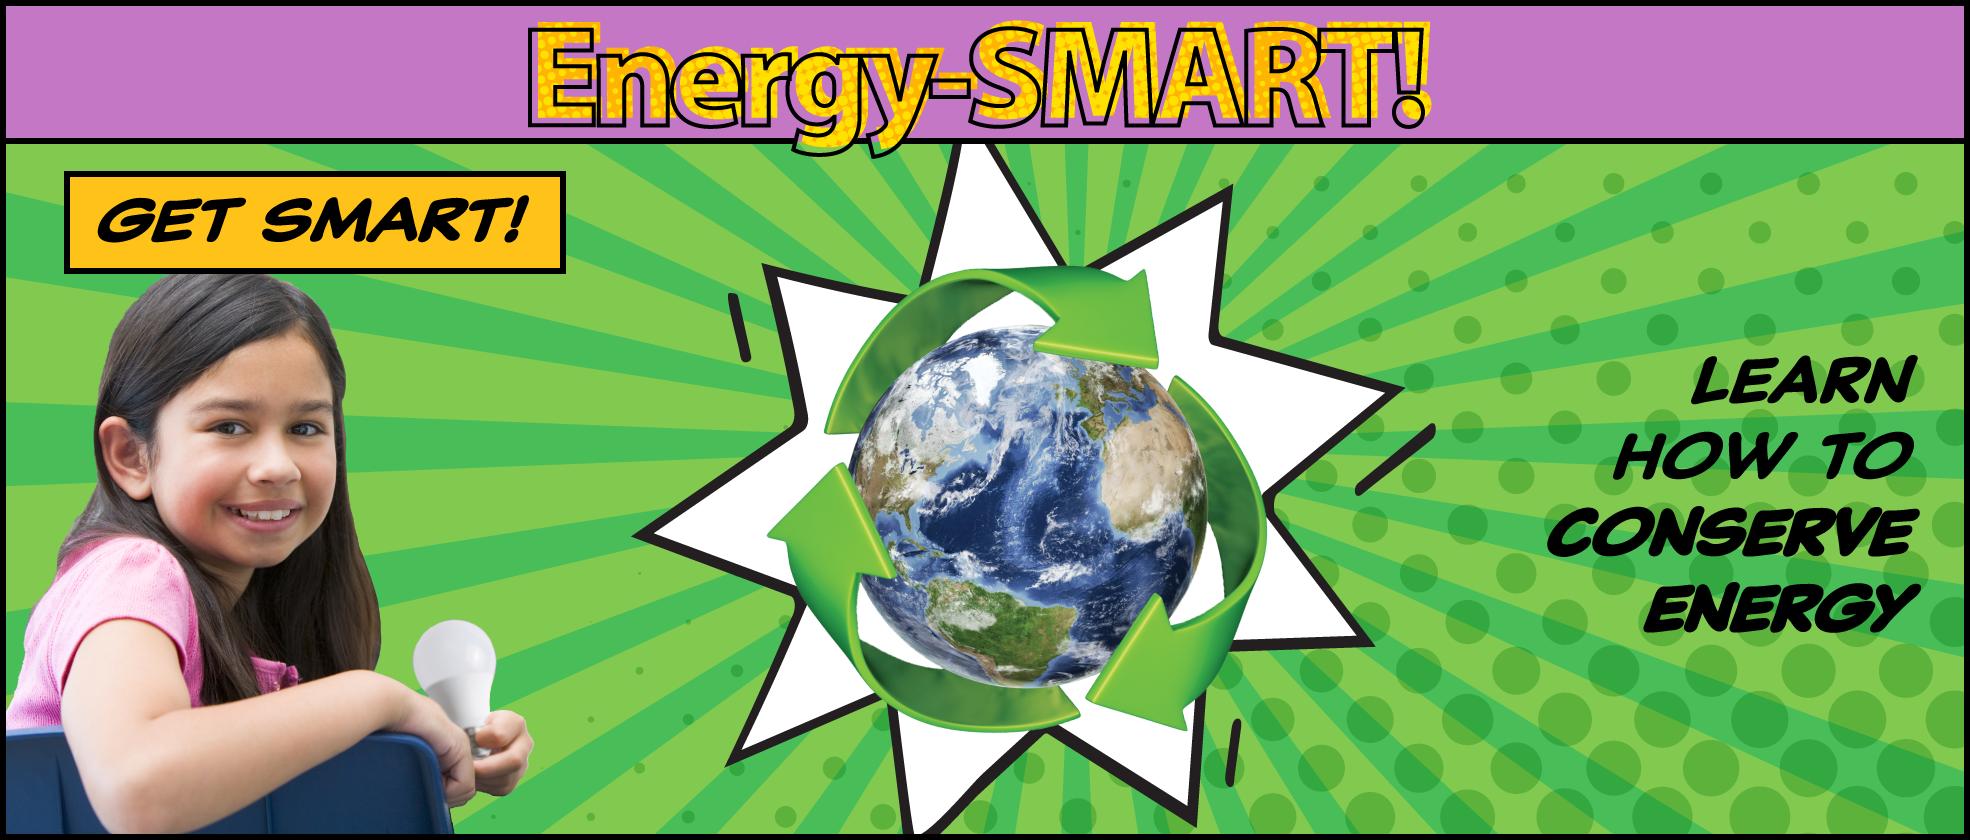 66510 Energy SMART hmpg carousel 1970x840 1